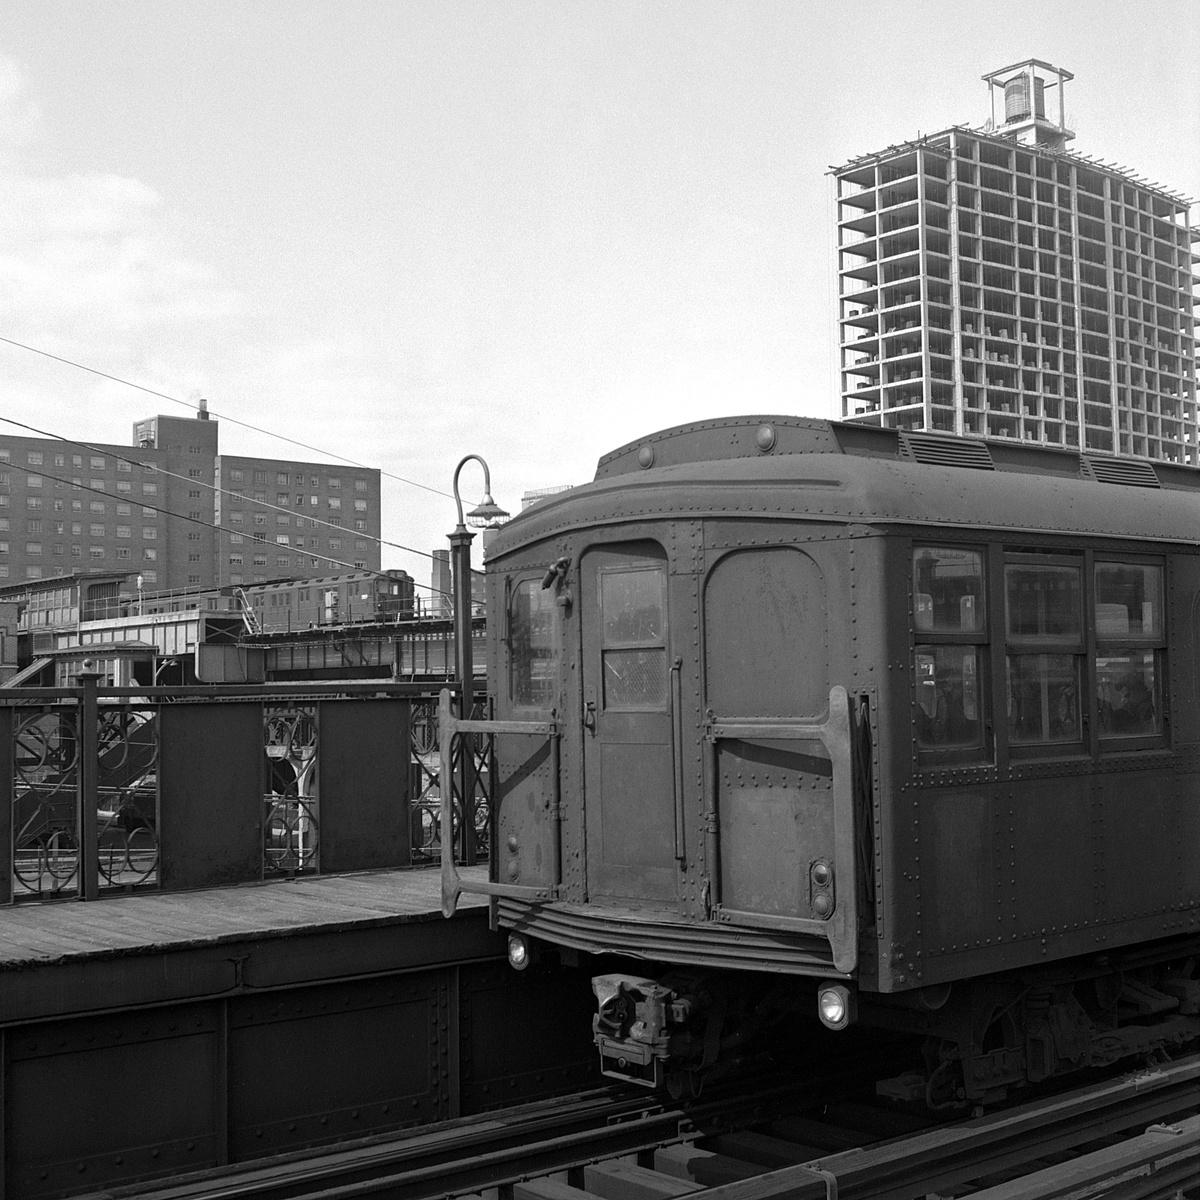 (508k, 1200x1200)<br><b>Country:</b> United States<br><b>City:</b> New York<br><b>System:</b> New York City Transit<br><b>Line:</b> BMT Canarsie Line<br><b>Location:</b> Livonia Avenue<br><b>Car:</b> BMT A/B-Type Standard  <br><b>Collection of:</b> David Pirmann<br><b>Date:</b> 3/22/1969<br><b>Viewed (this week/total):</b> 0 / 322